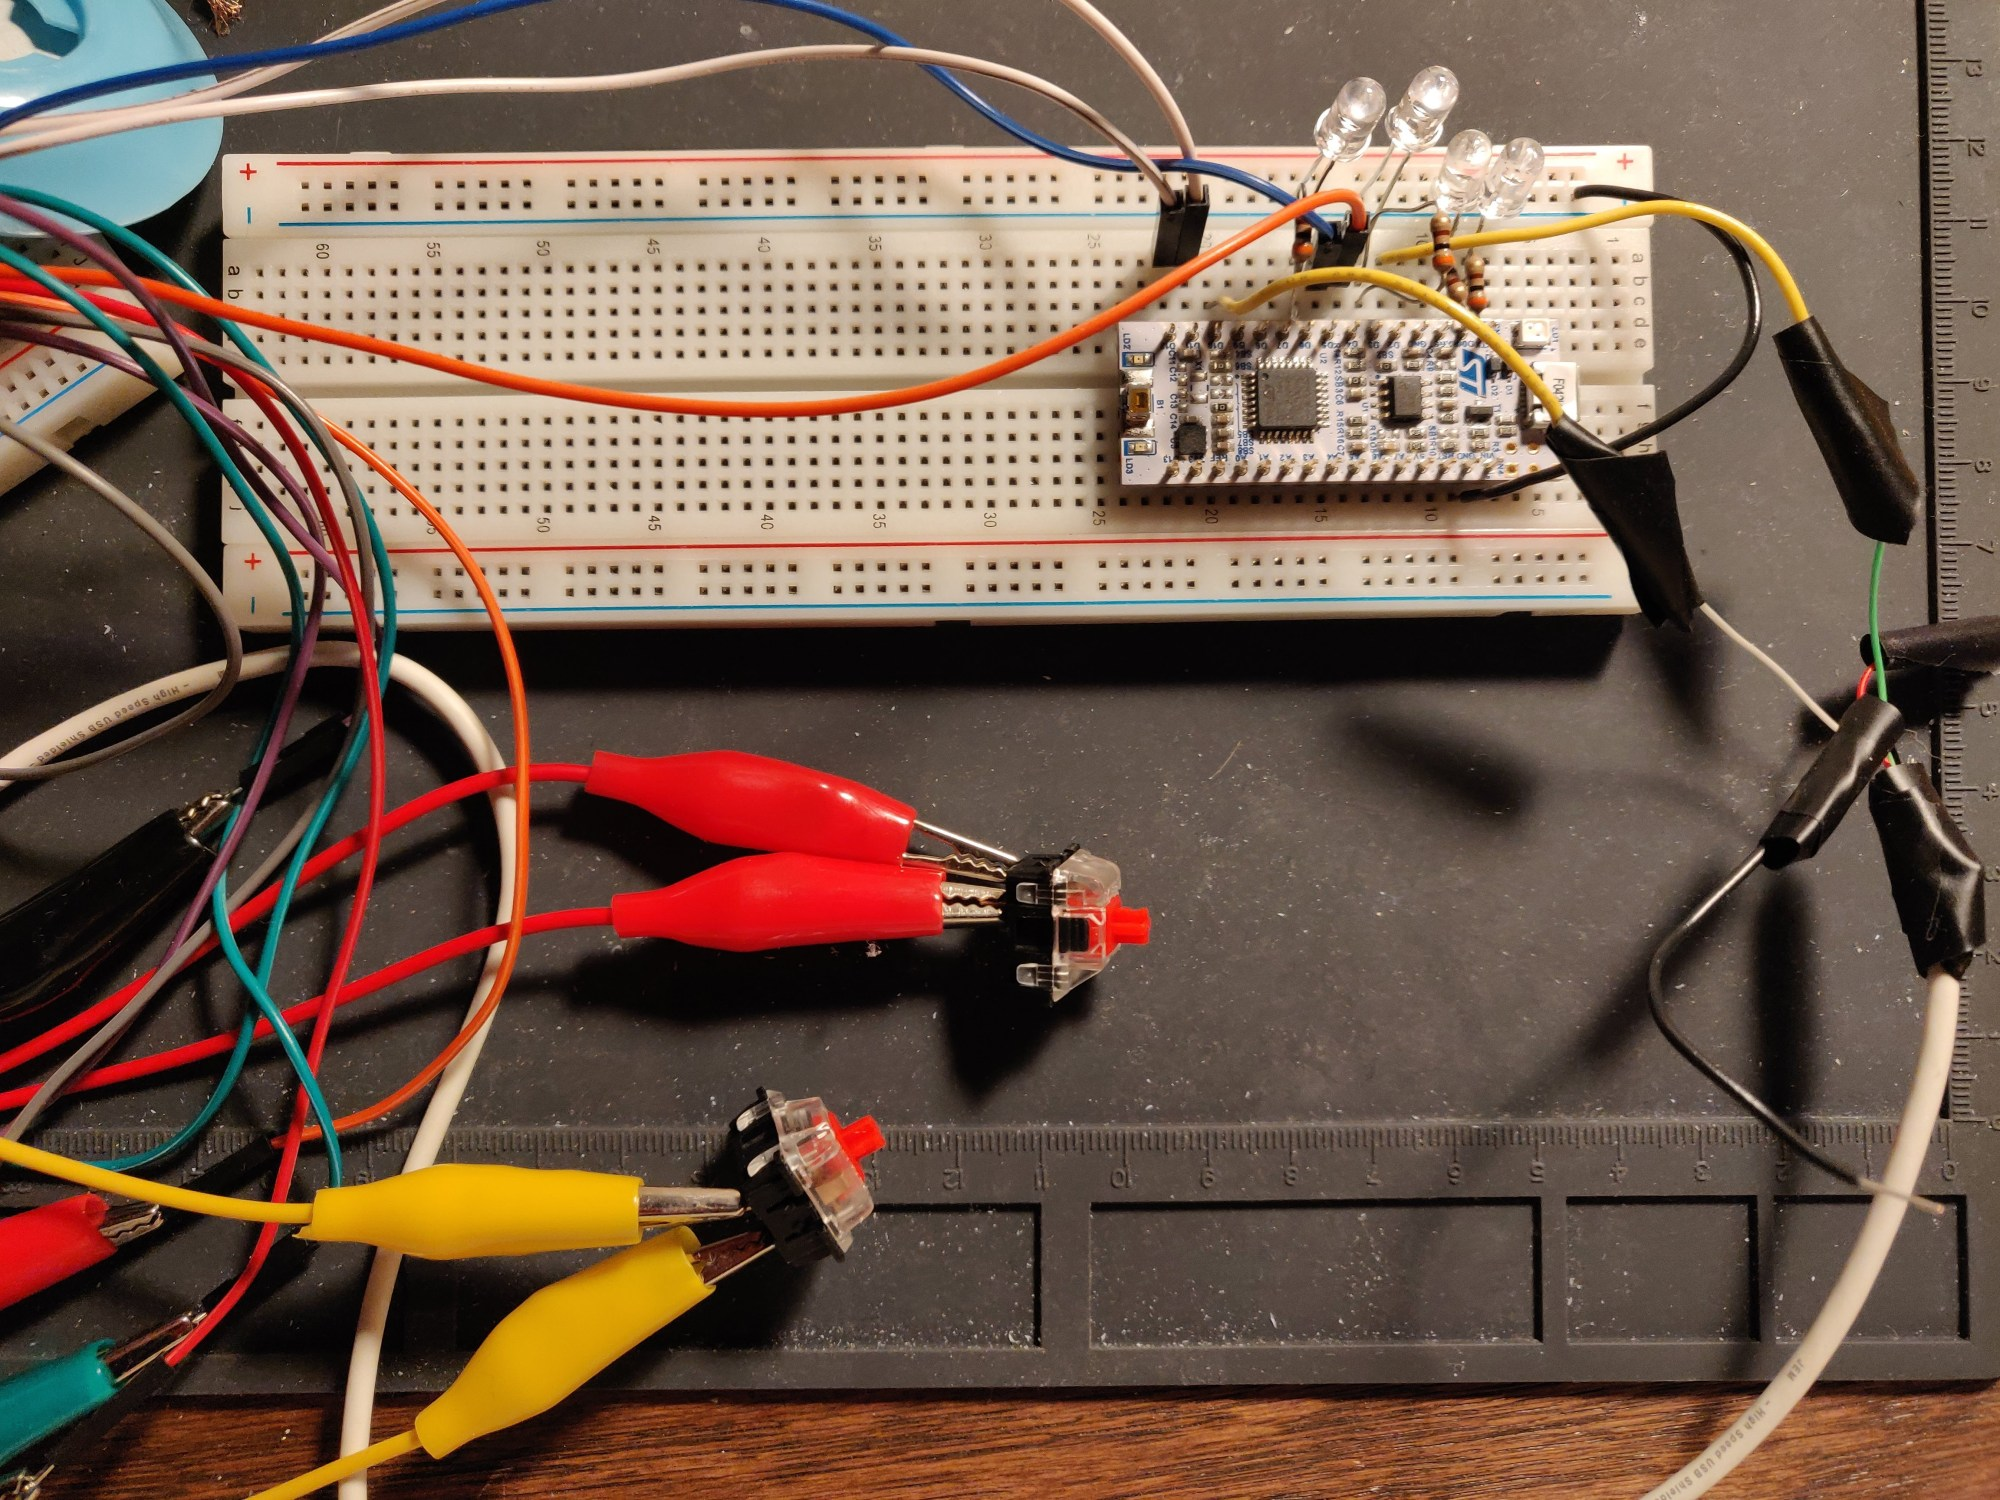 hight resolution of keebee prototype circuit